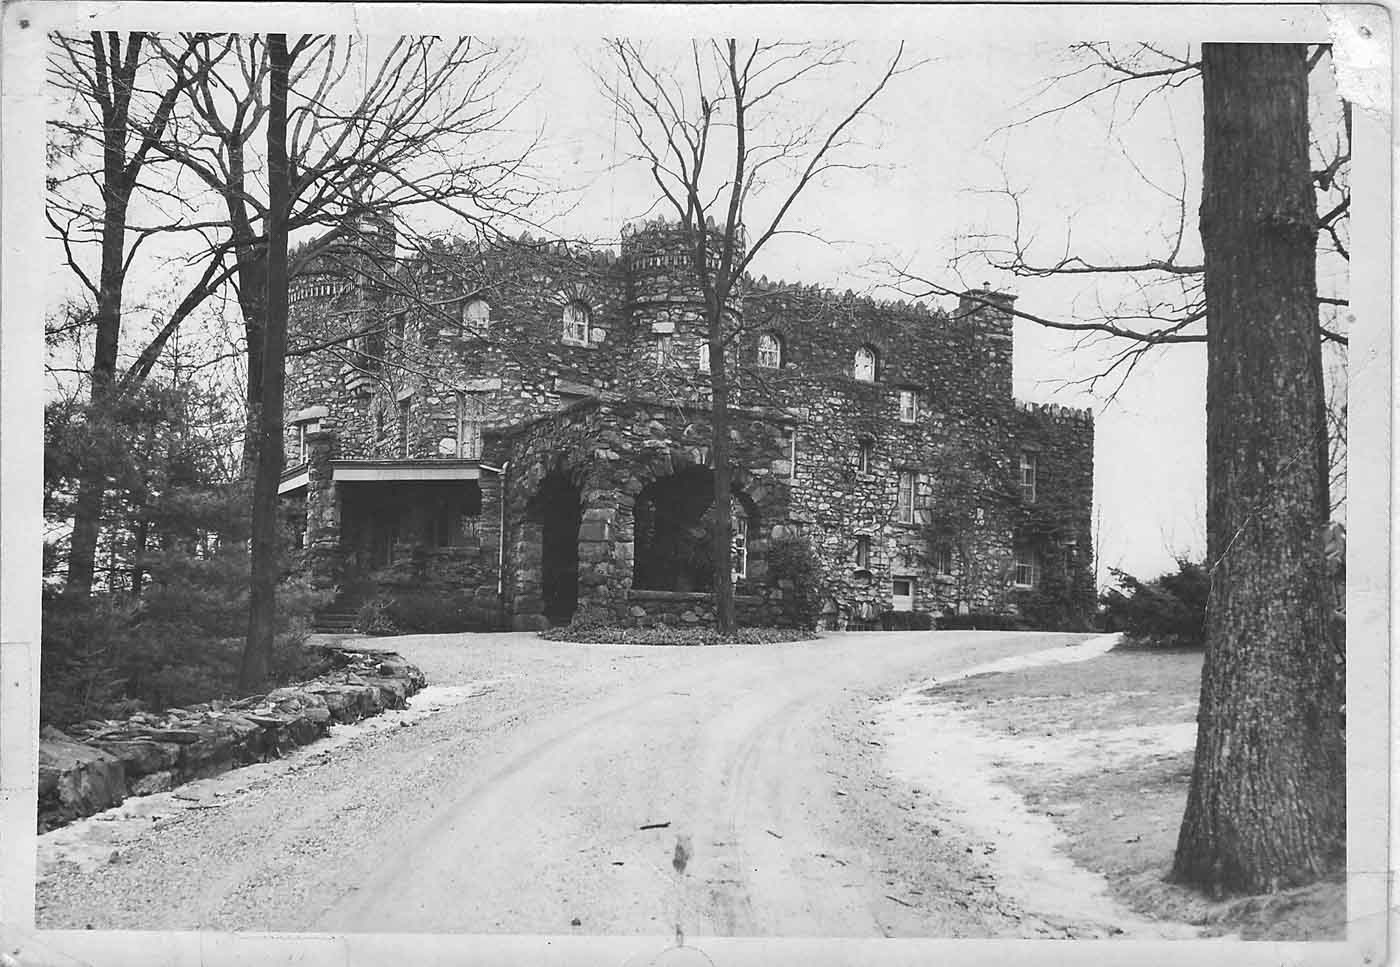 hearthstone-from-driveway-beautiful-stone-castle